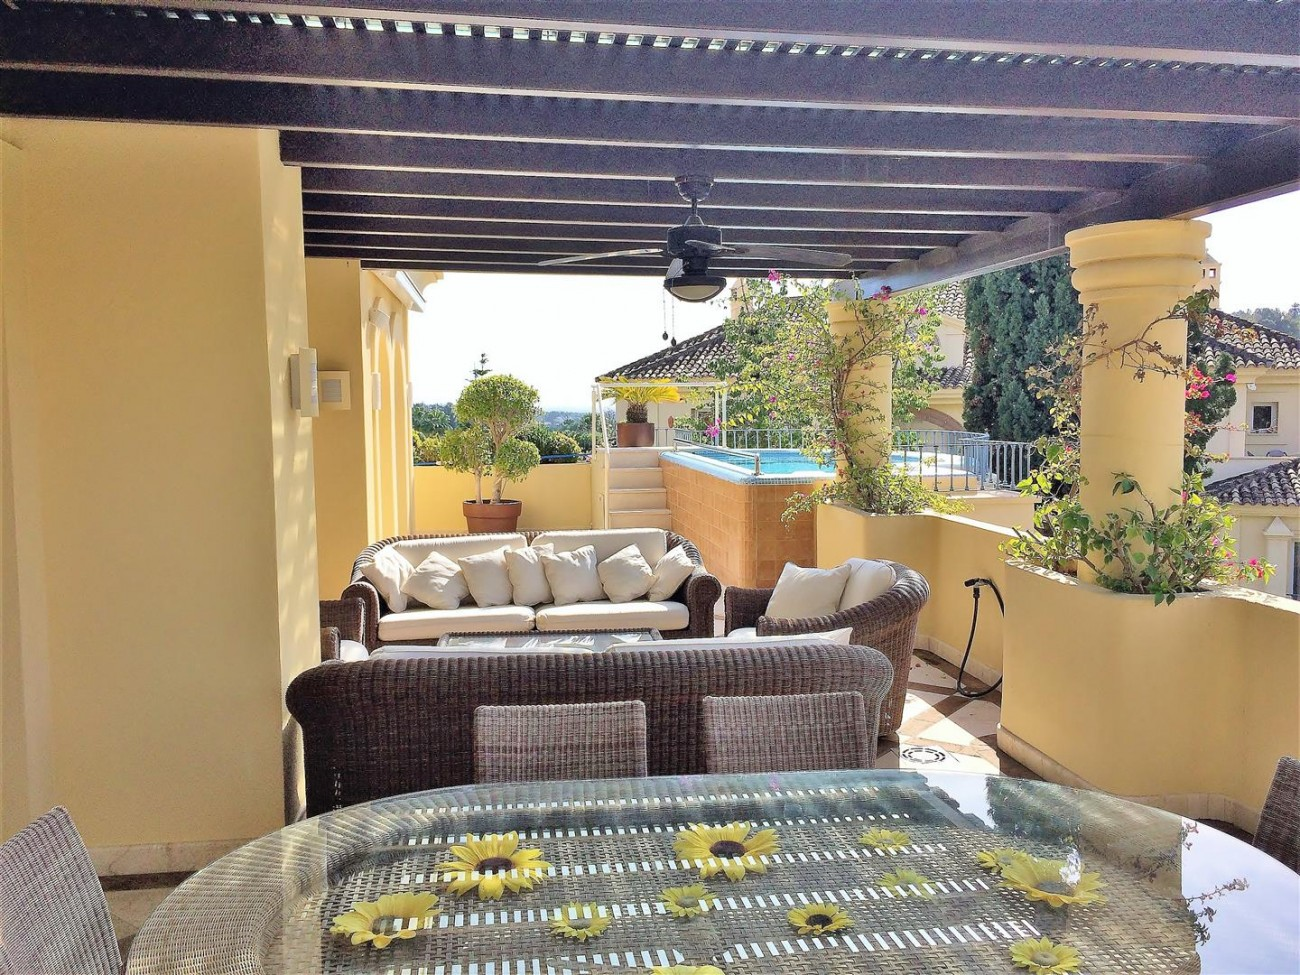 Penthouse for sale Las Alamandas Nueva Andalucia Marbella Spain (25) (Large)